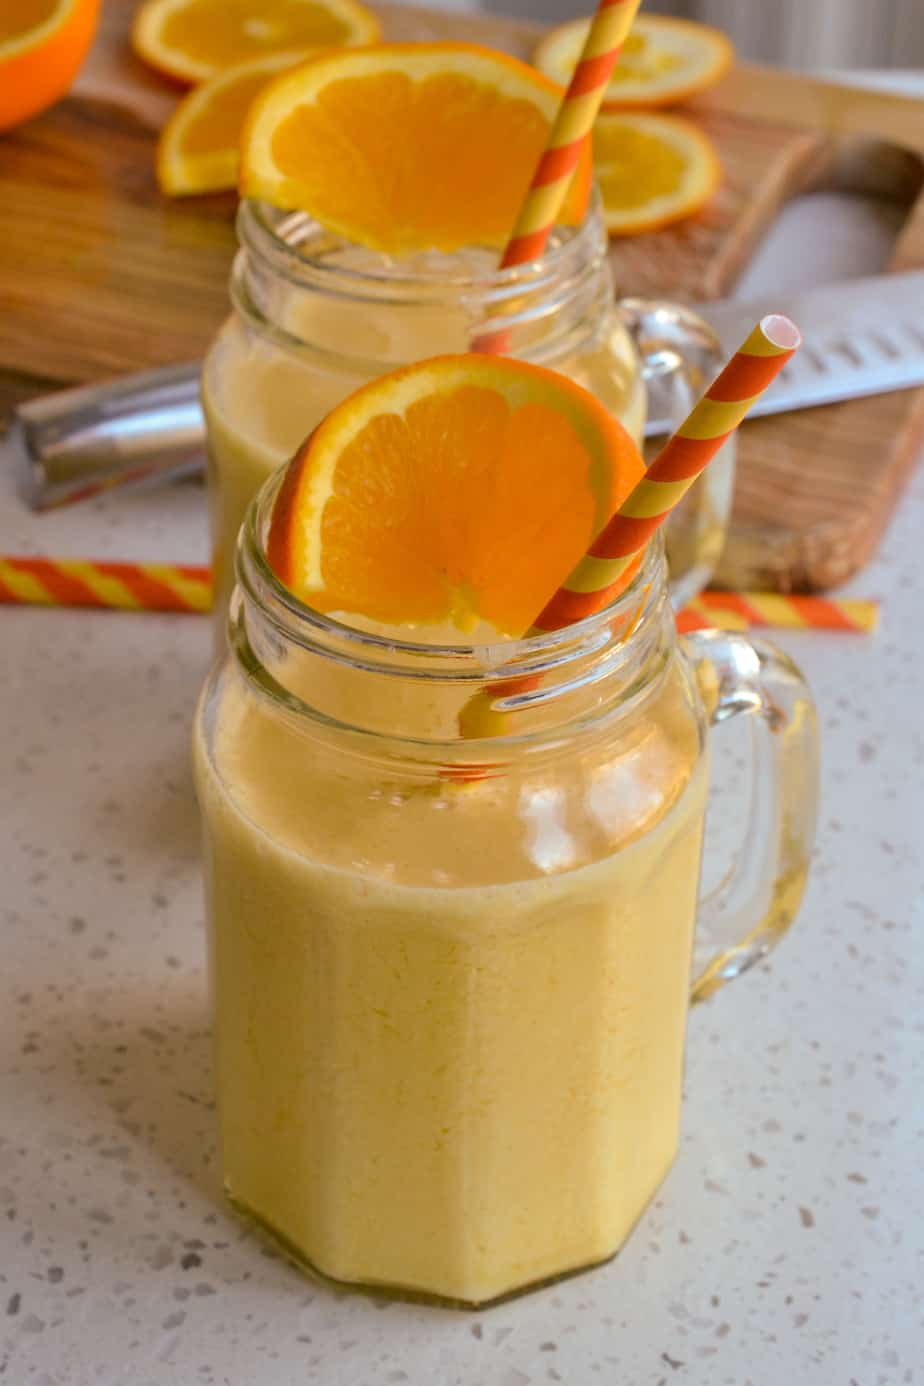 Glasses of creamy orange julius topped with orange slices